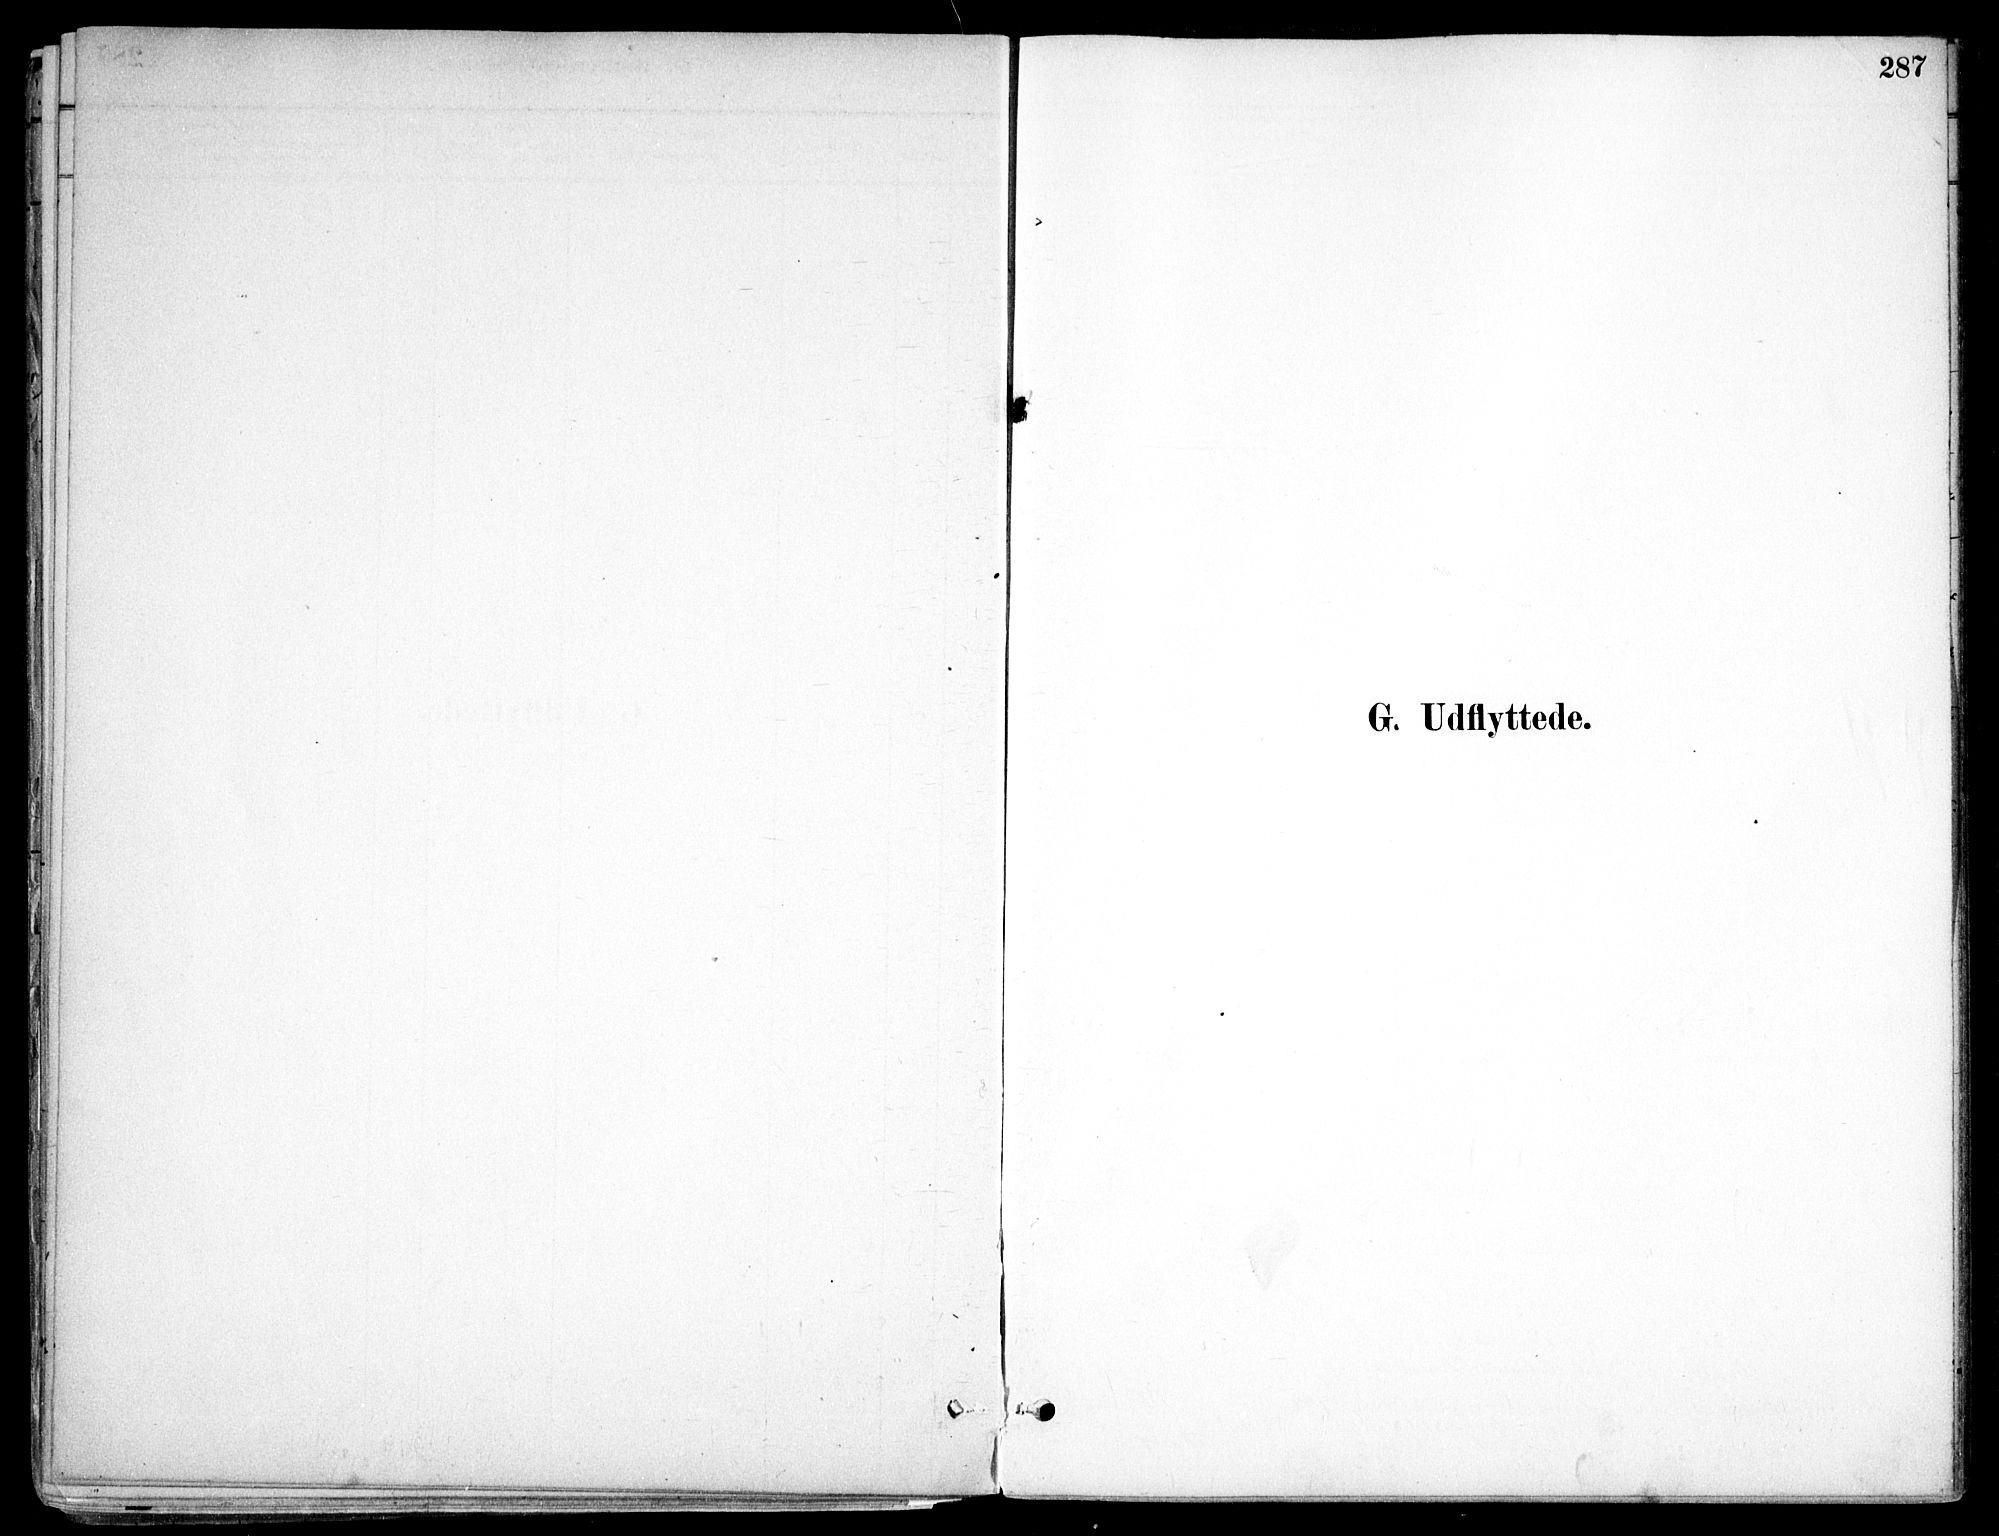 SAO, Nes prestekontor Kirkebøker, F/Fc/L0002: Ministerialbok nr. IIi 2, 1882-1916, s. 287